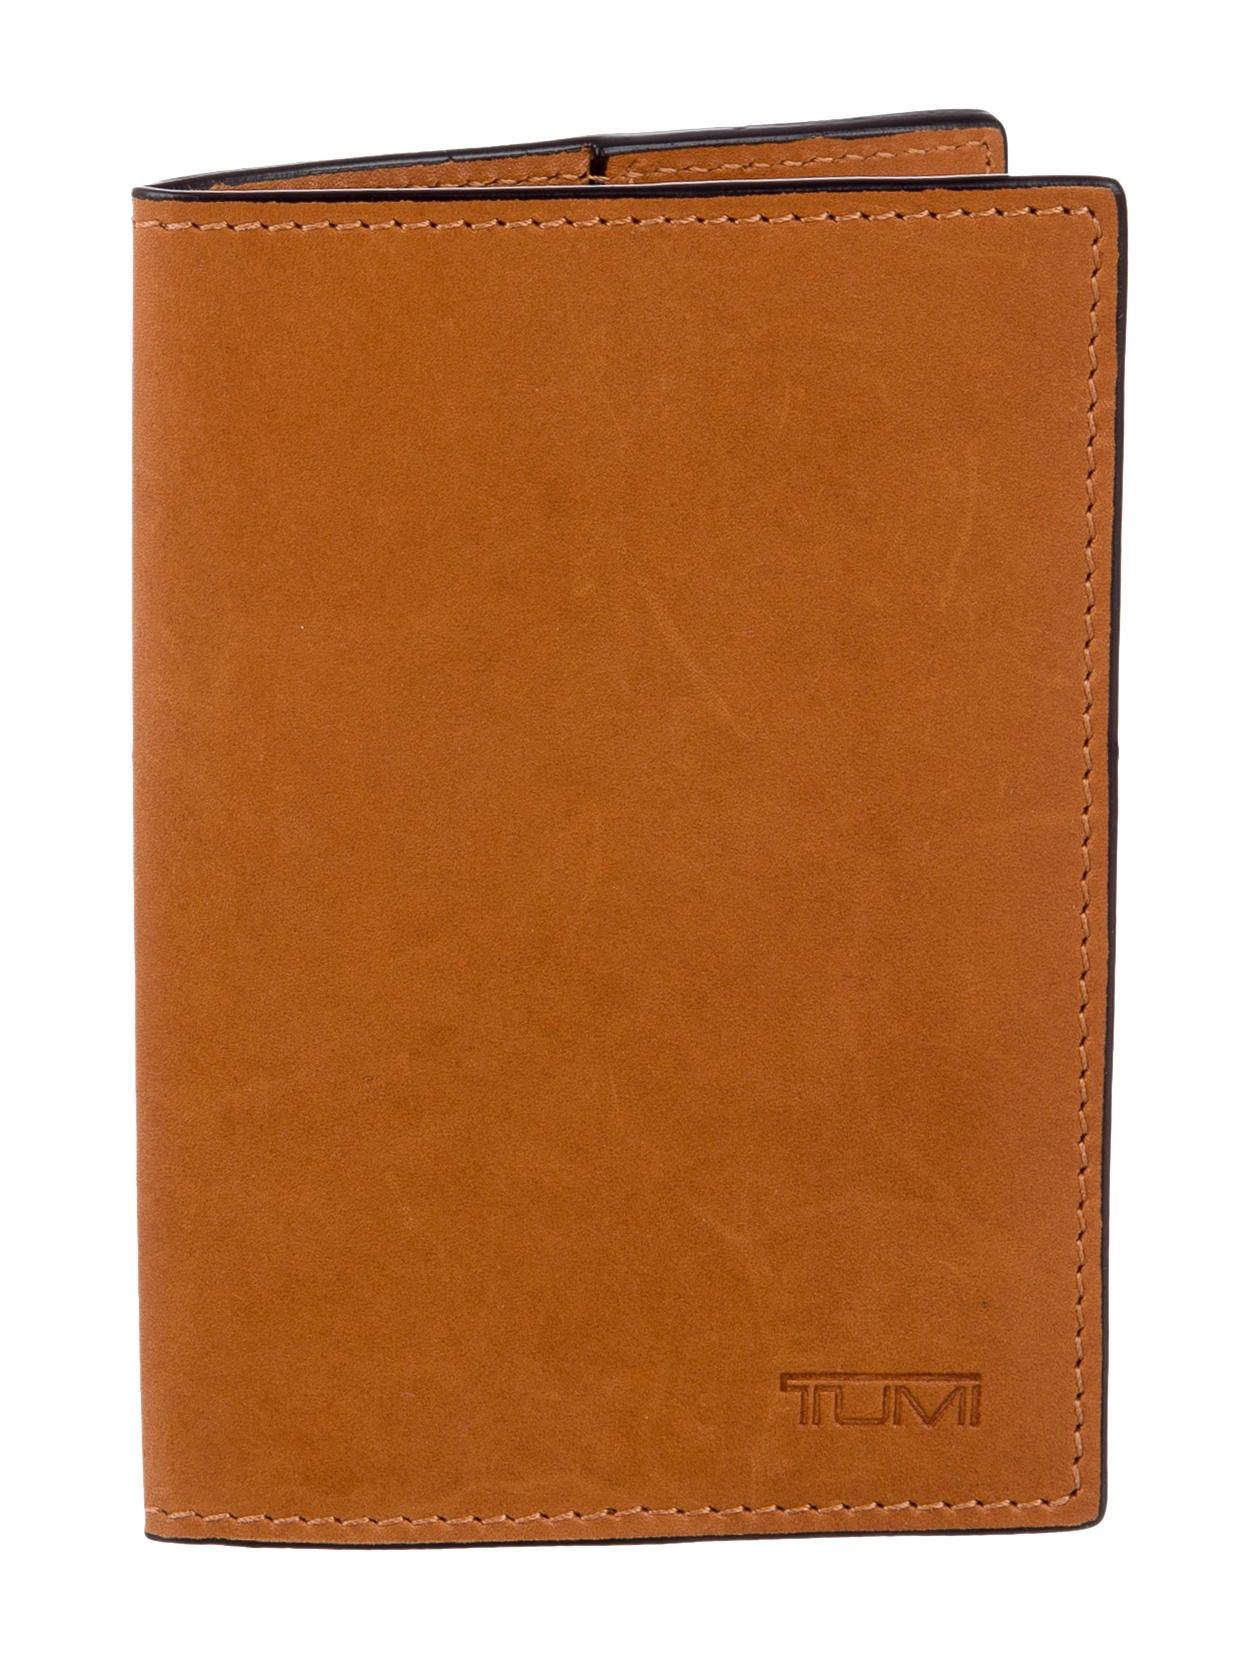 Tumi Leather Passport Holder - Accessories - TMI21459 | The RealReal